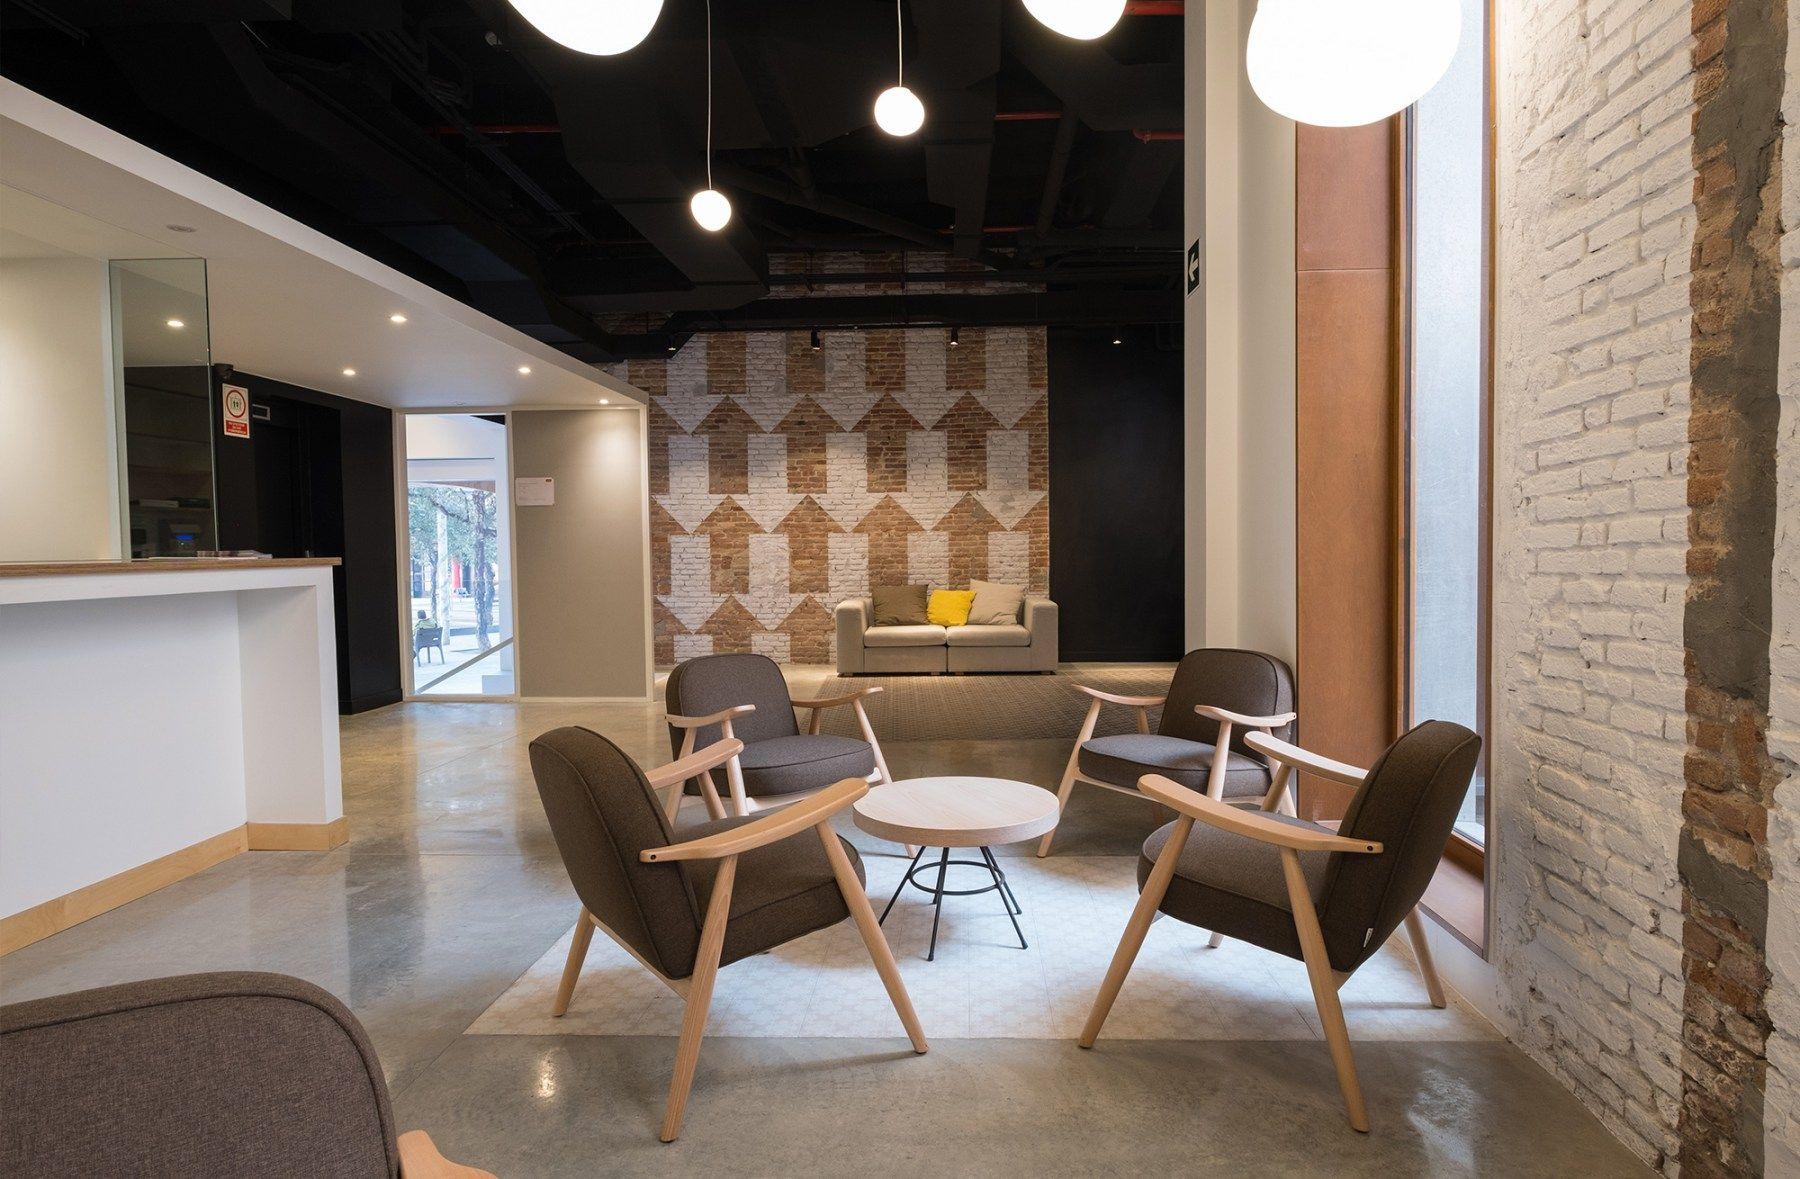 Residencia Residencia Unihabit Ciutat Vella Barcelona  # Muebles Lujo Barcelona